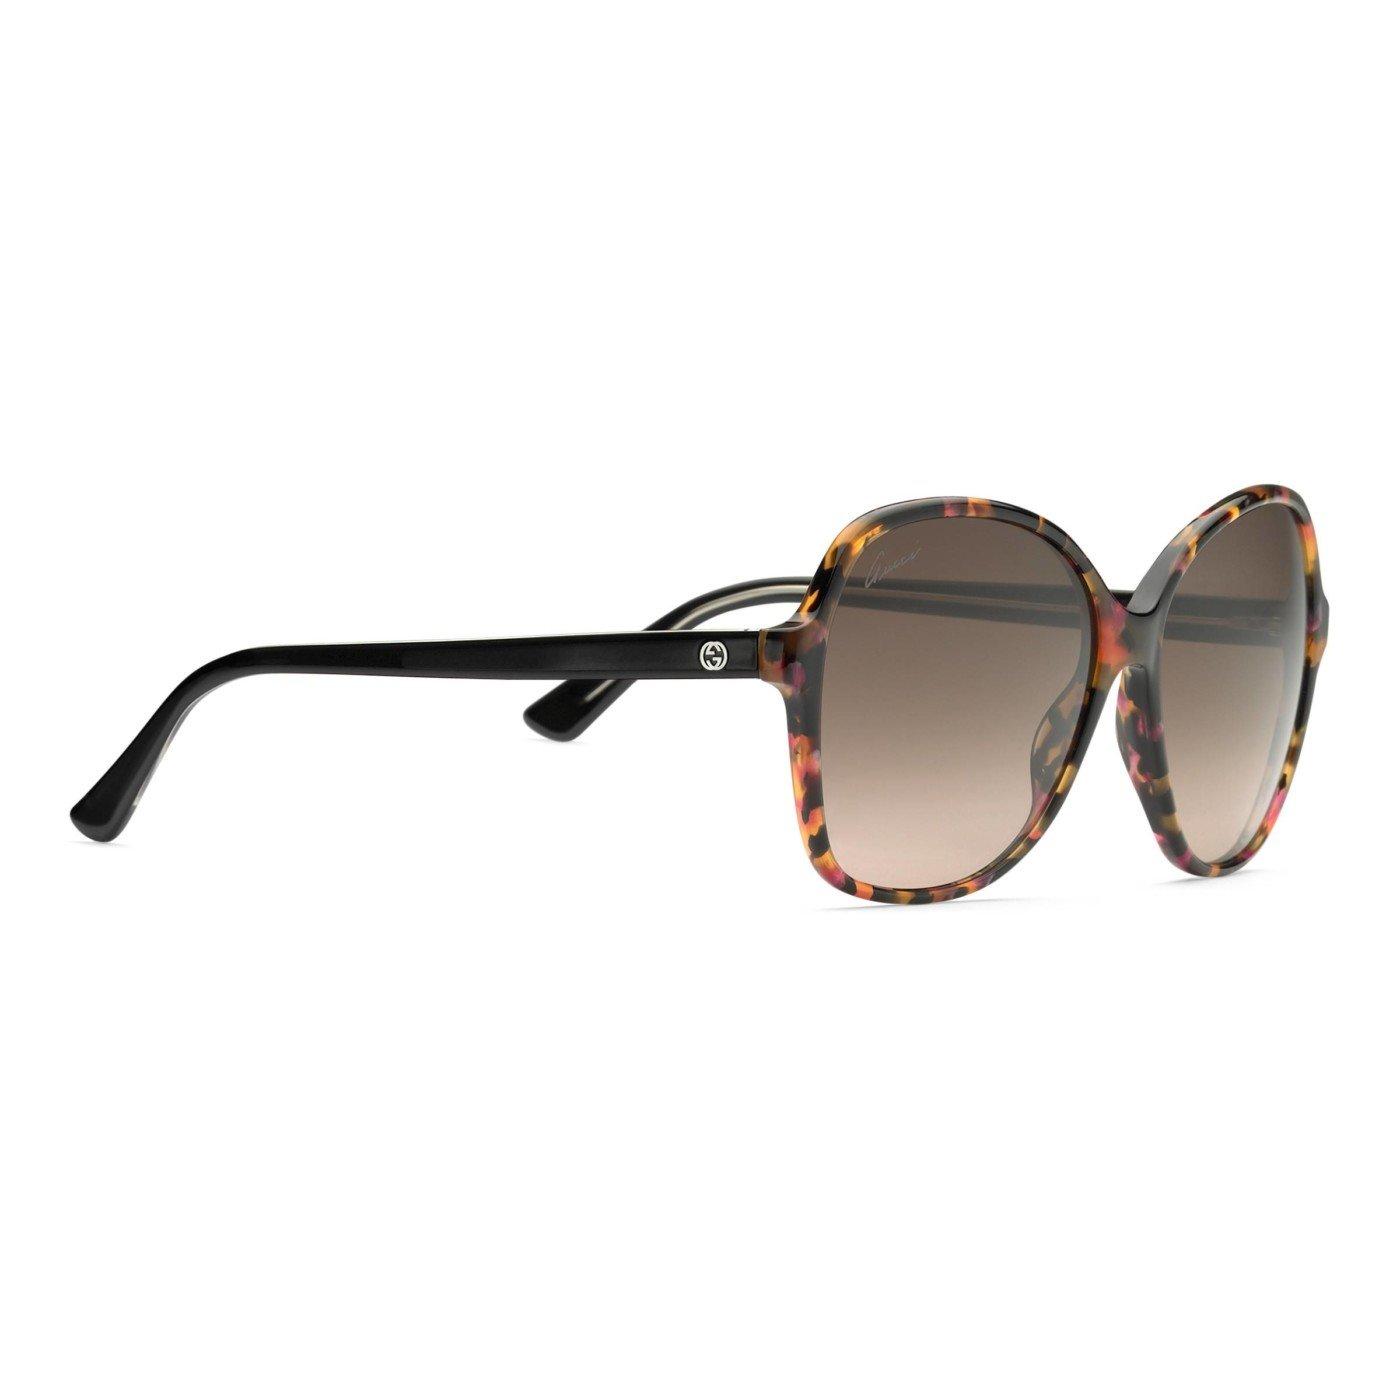 d32f643403 Gucci Women s Violet Orange GG 3721 S Brown Lens Lightweight Acetate  Sunglasses  Amazon.co.uk  Clothing